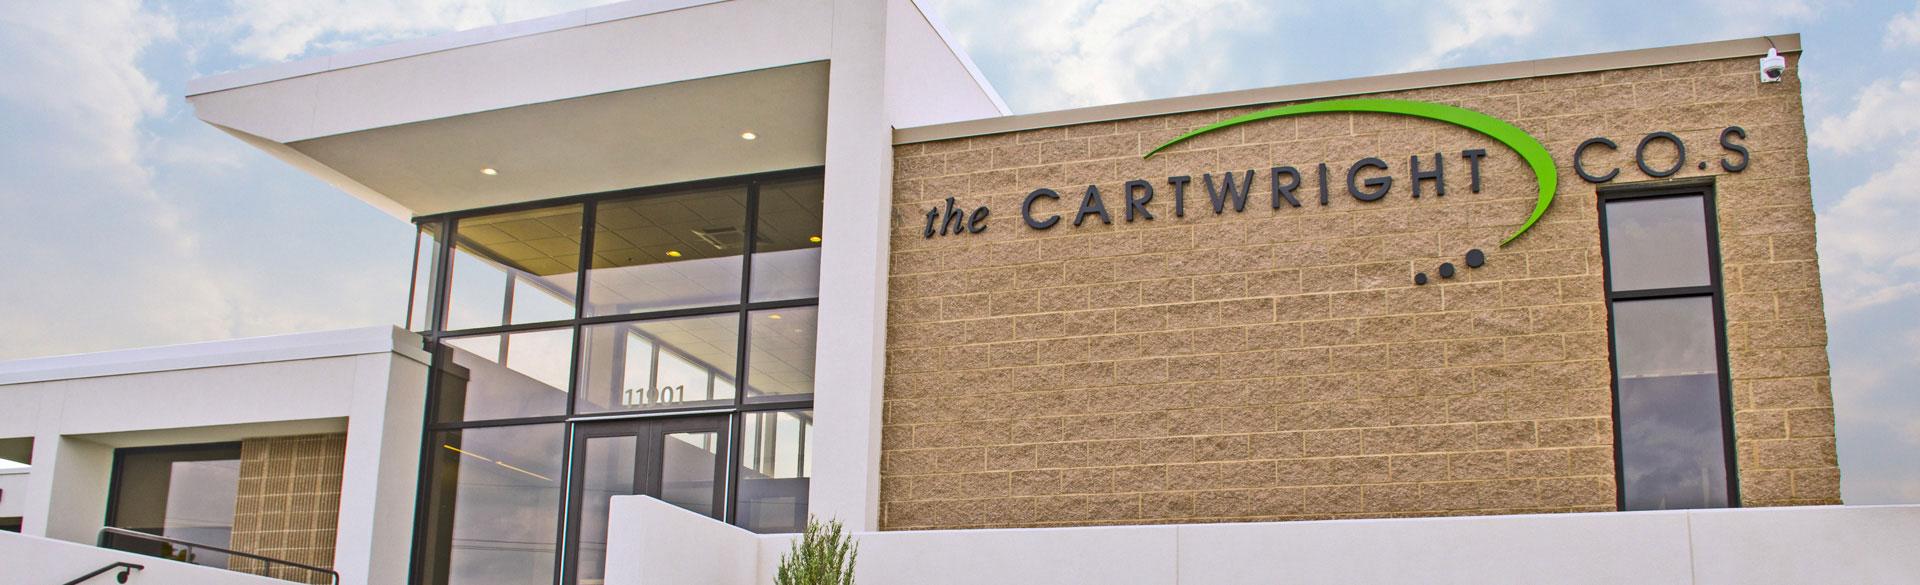 Cartwright-Companies-Building-1920x585